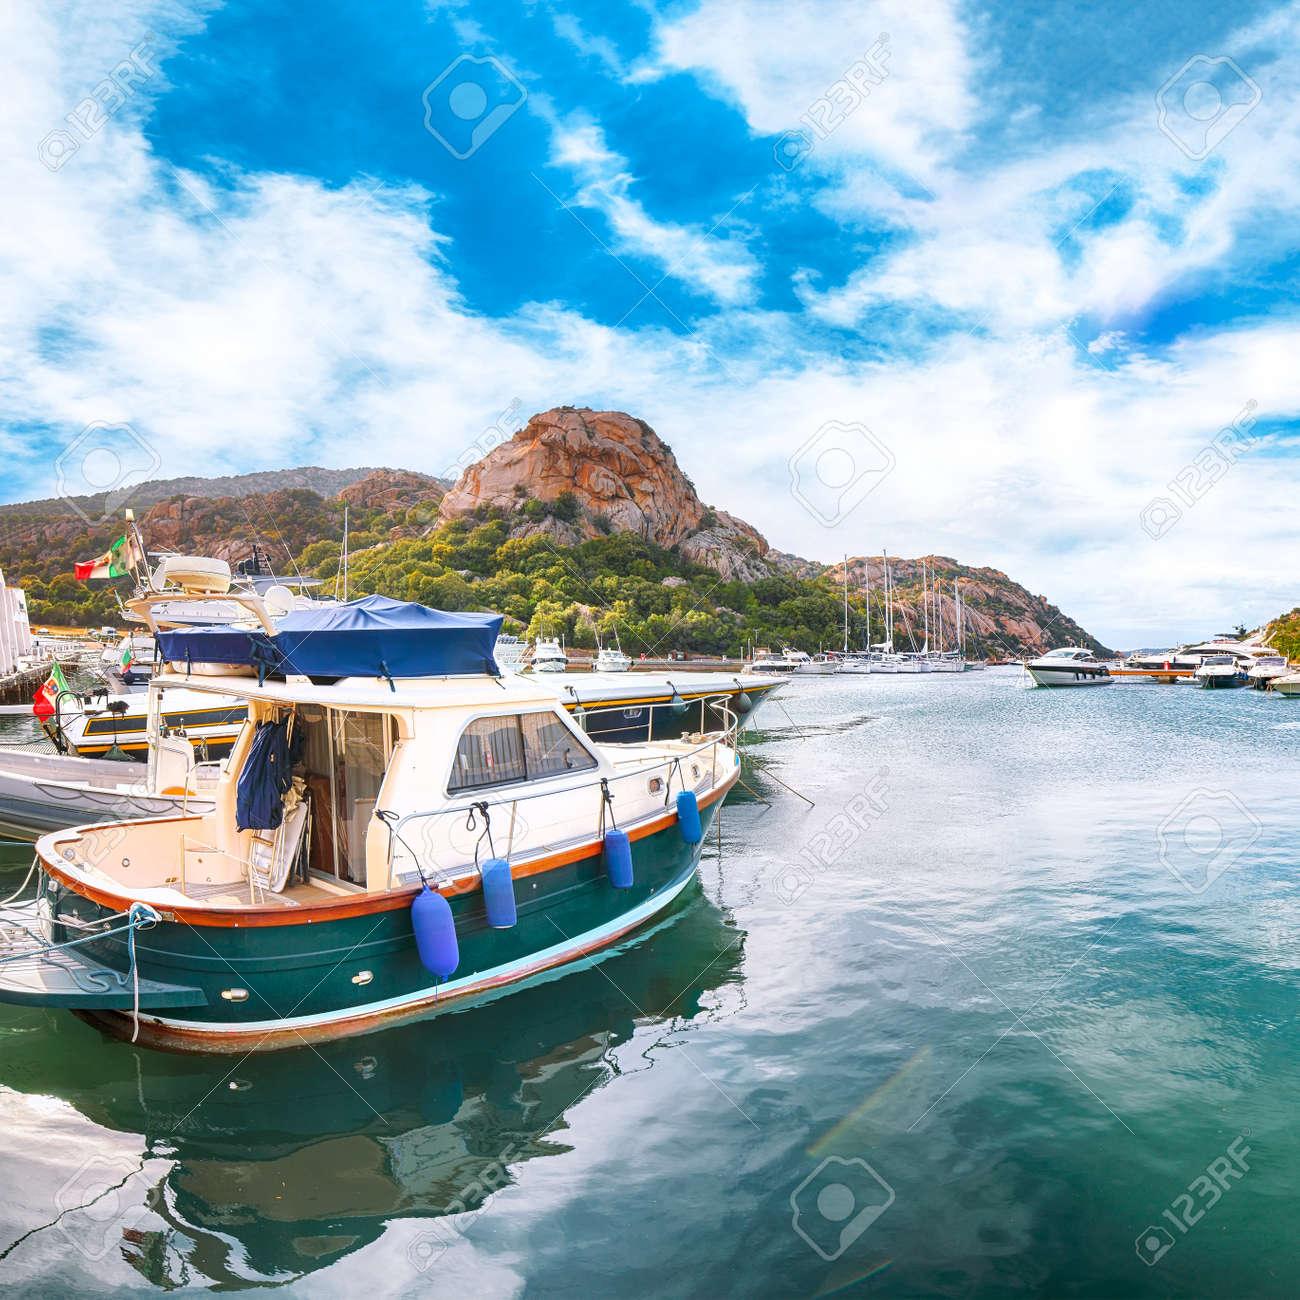 Splendid view of Poltu Quatu port and bay with luxury yachts on Costa Smeralda. Popular travel destination of Mediterranean sea. Location: Poltu Quatu, Province of Sassari, Sardinia, Italy, Europe - 170378893